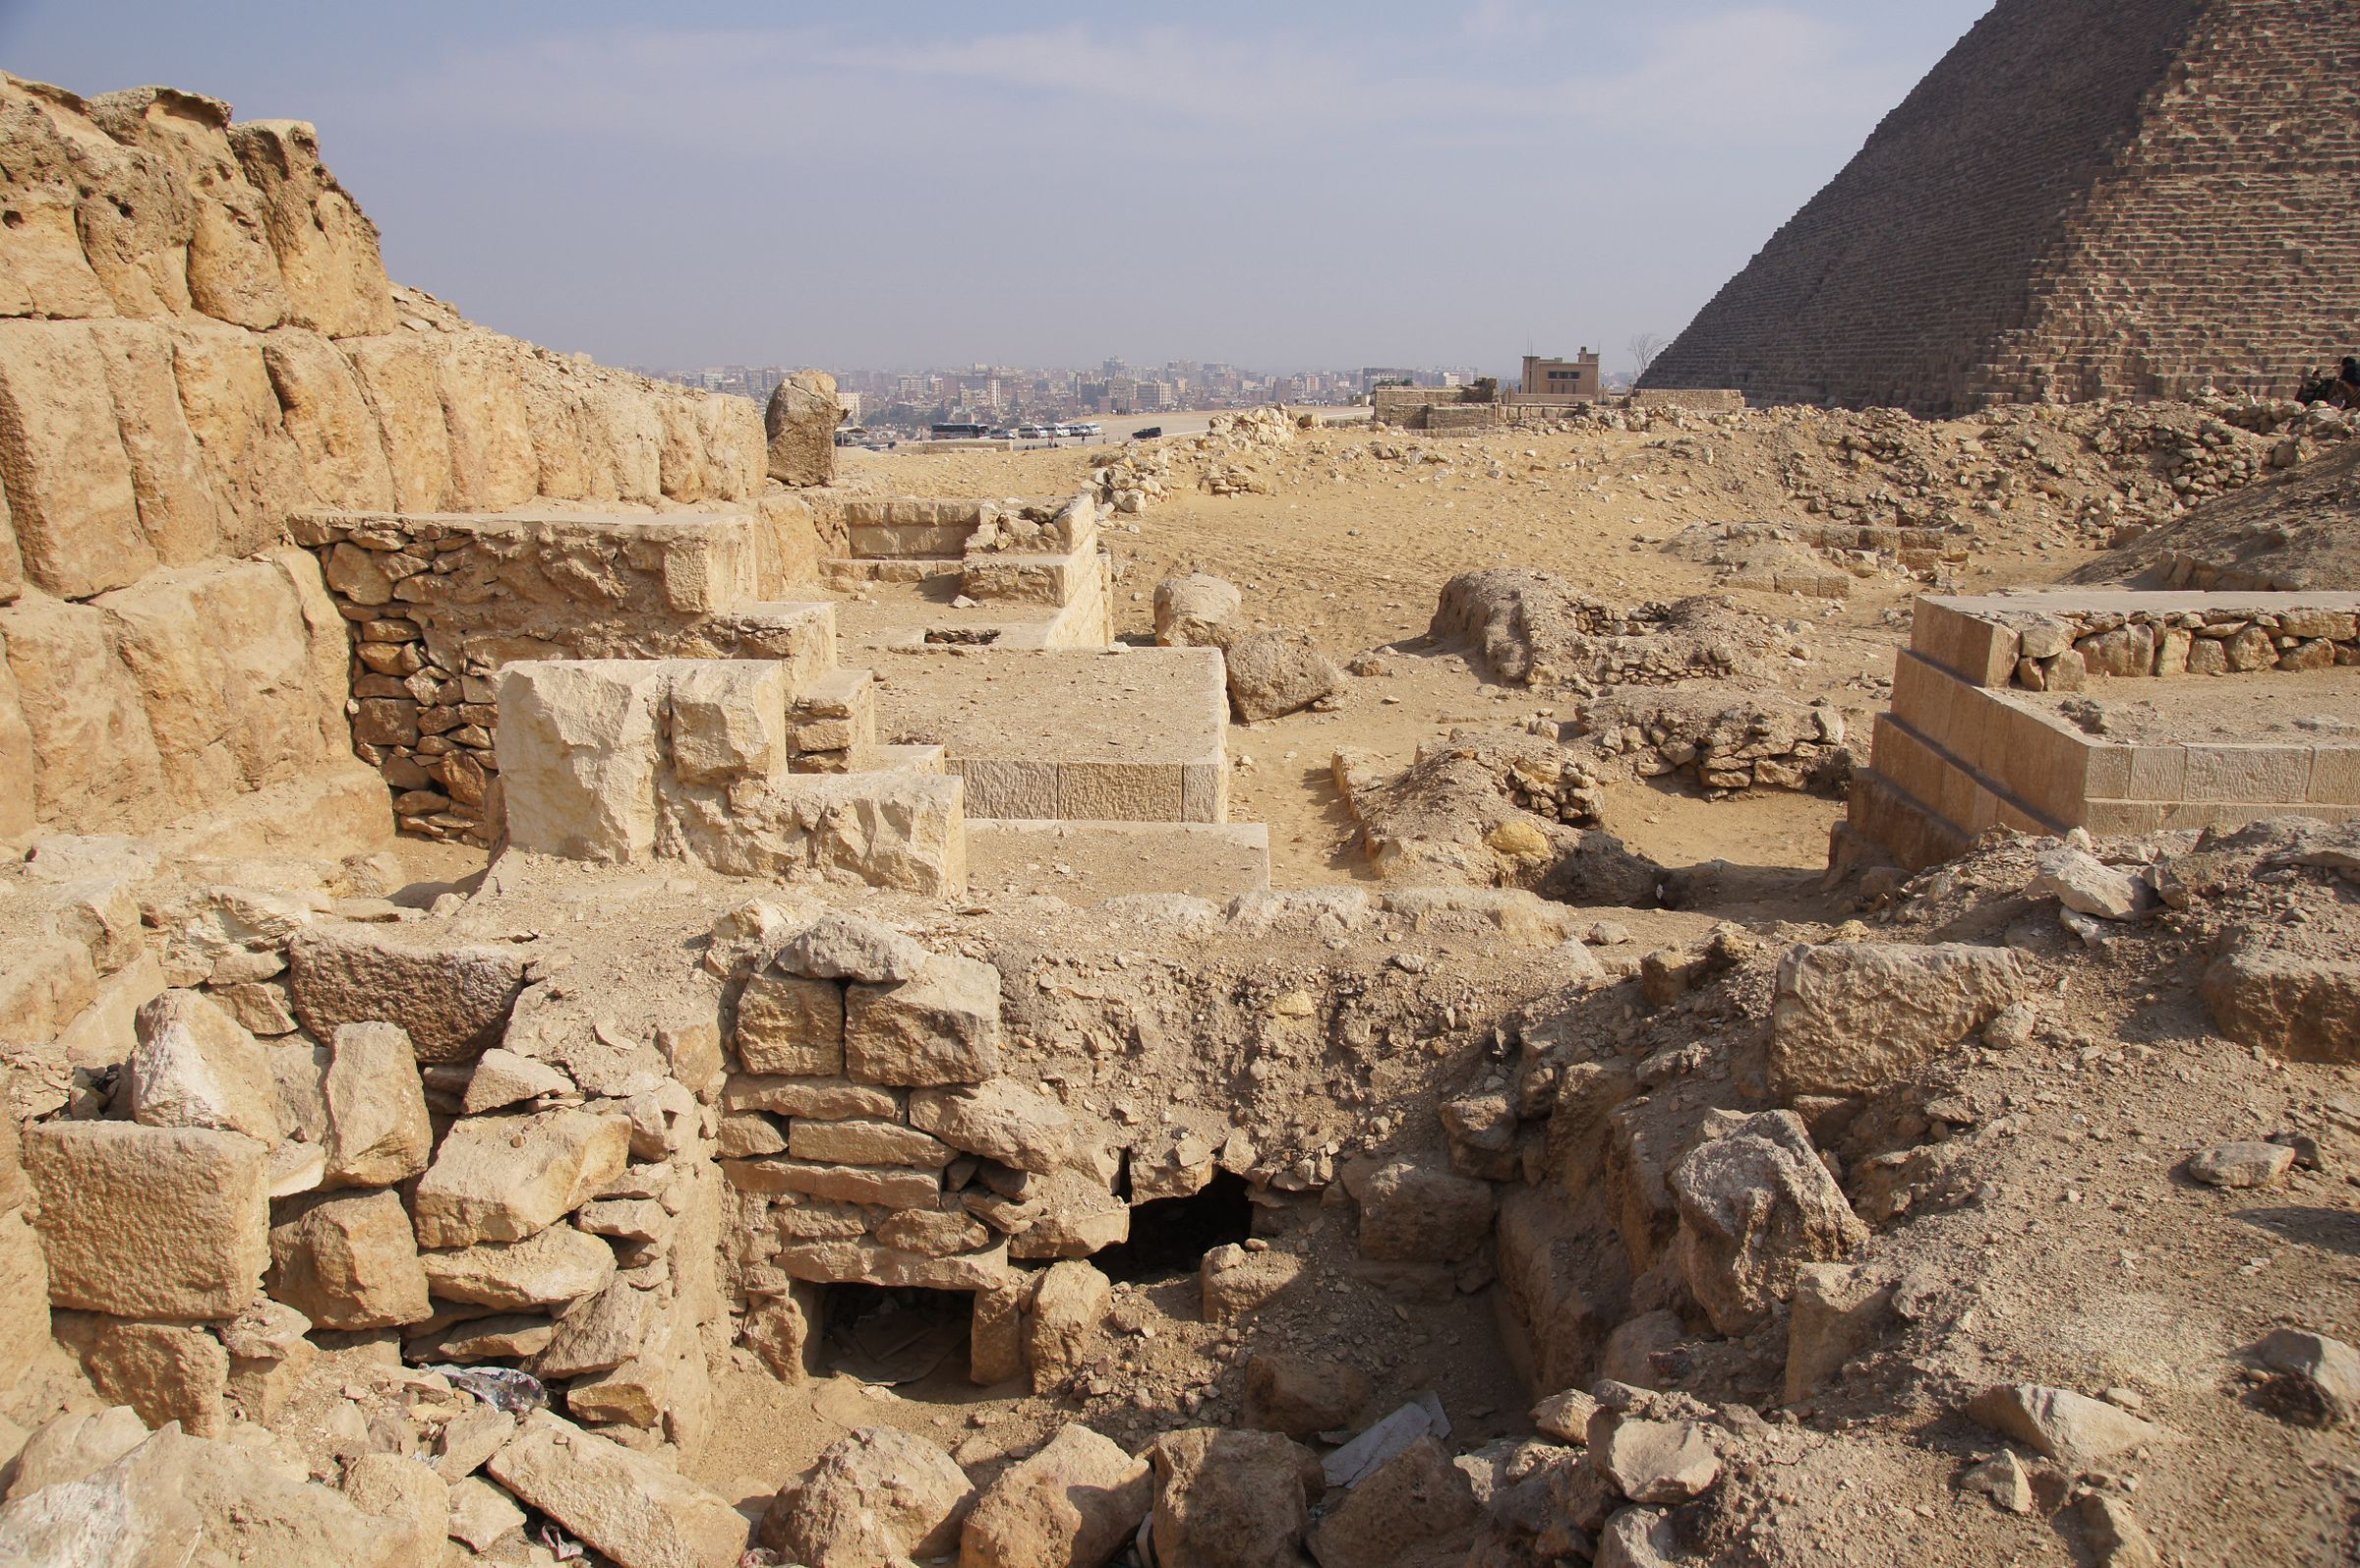 Western Cemetery: Site: Giza; View: G 2220, G 2150, G 2138, G 2139, G 2151, G 2156'